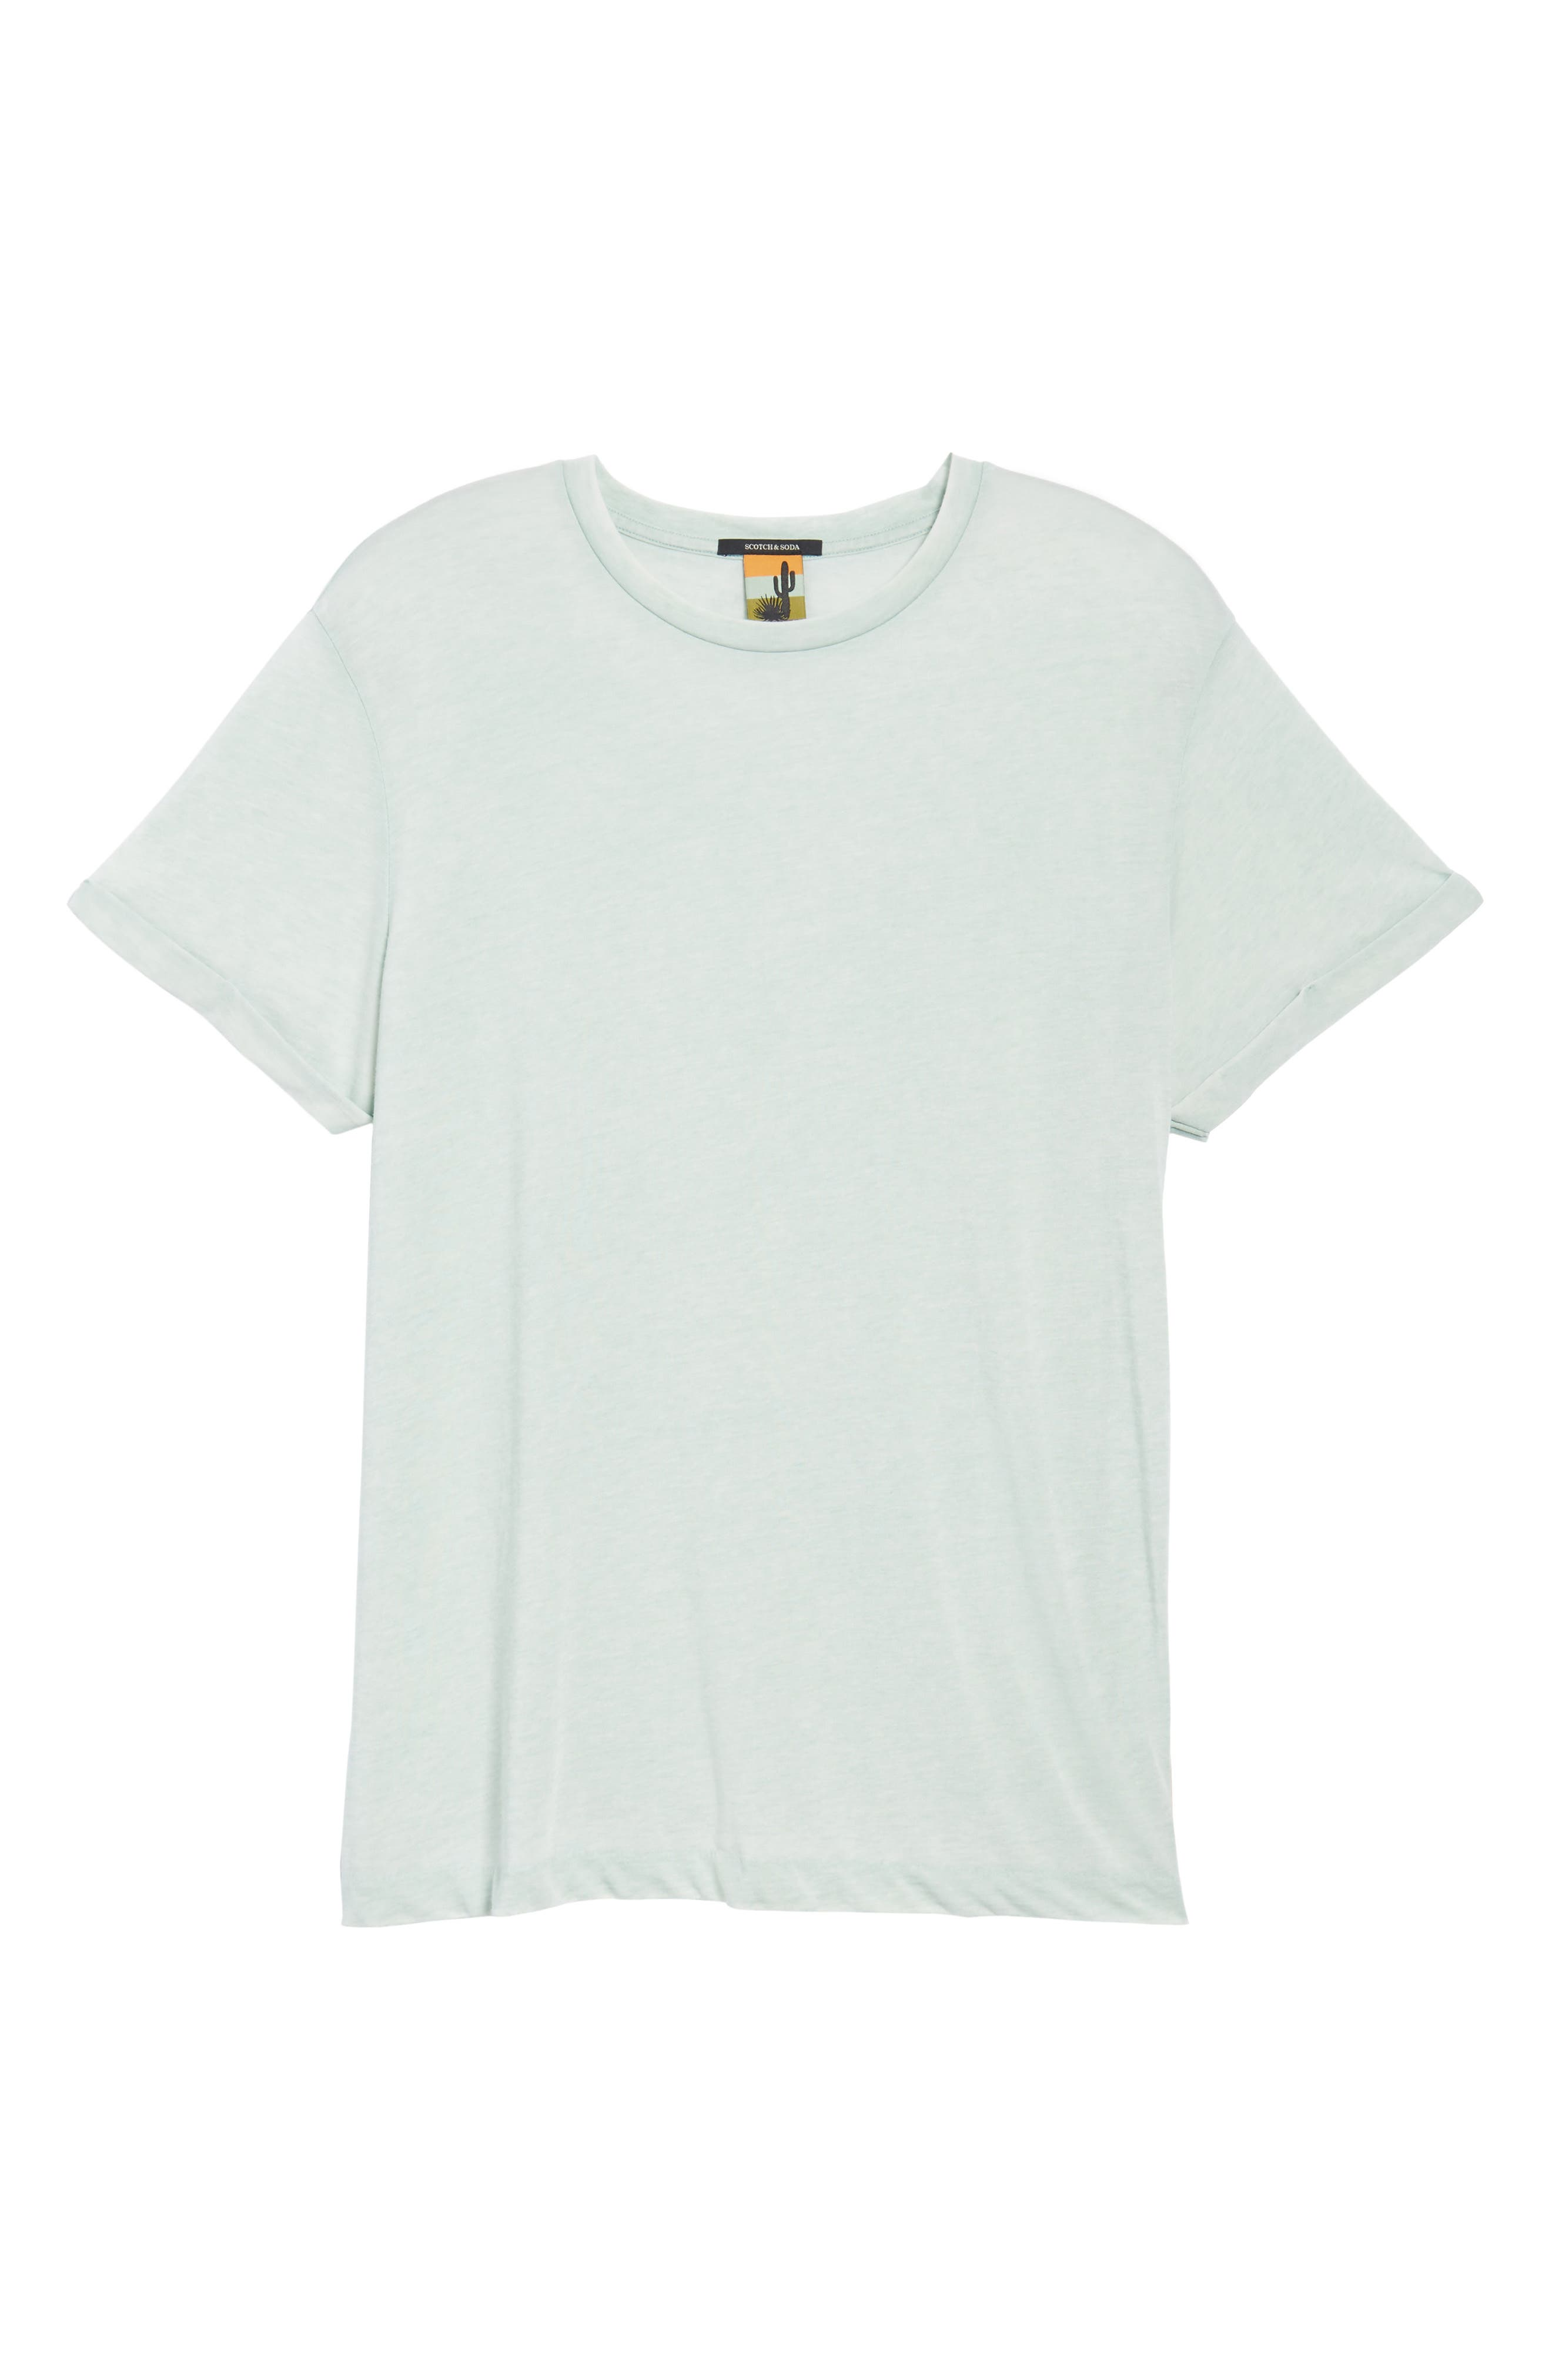 Ausbrenner T-Shirt,                             Alternate thumbnail 6, color,                             Seafoam Green Melange